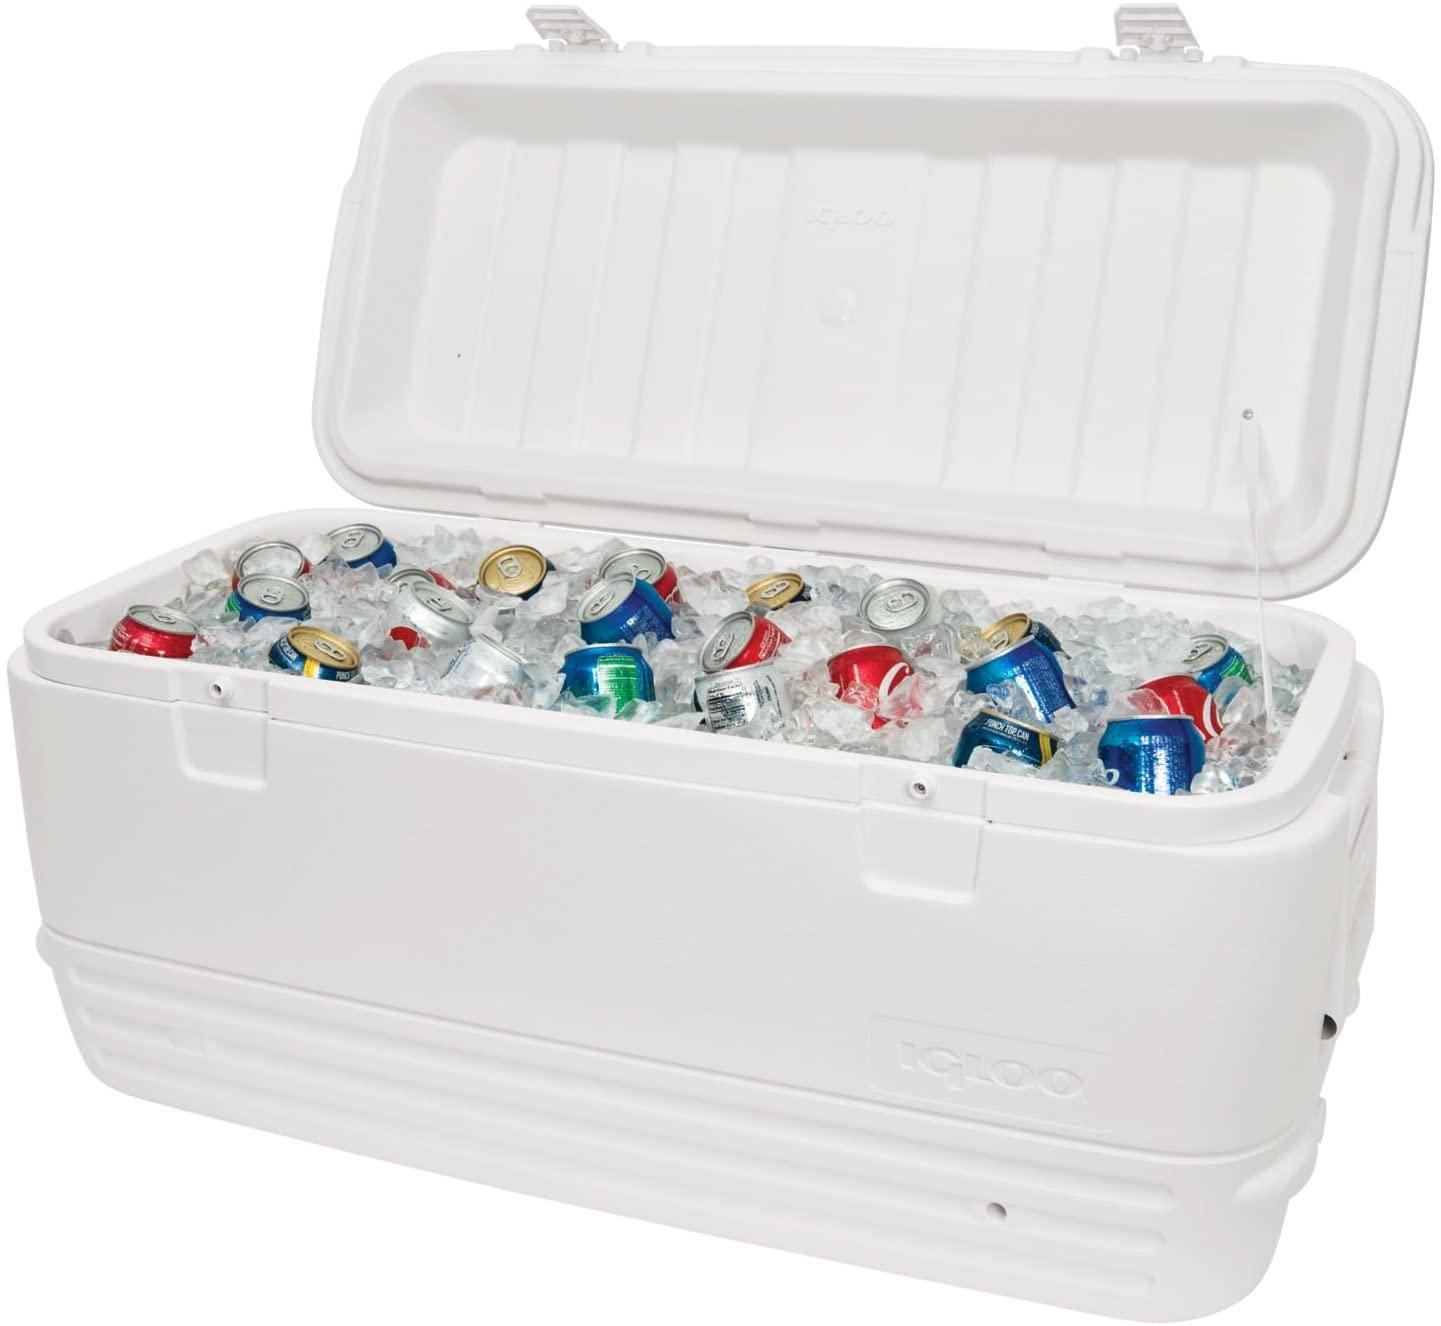 Igloo Polar Cooler (120-Quart, White) $57.00 @ Amazon.com